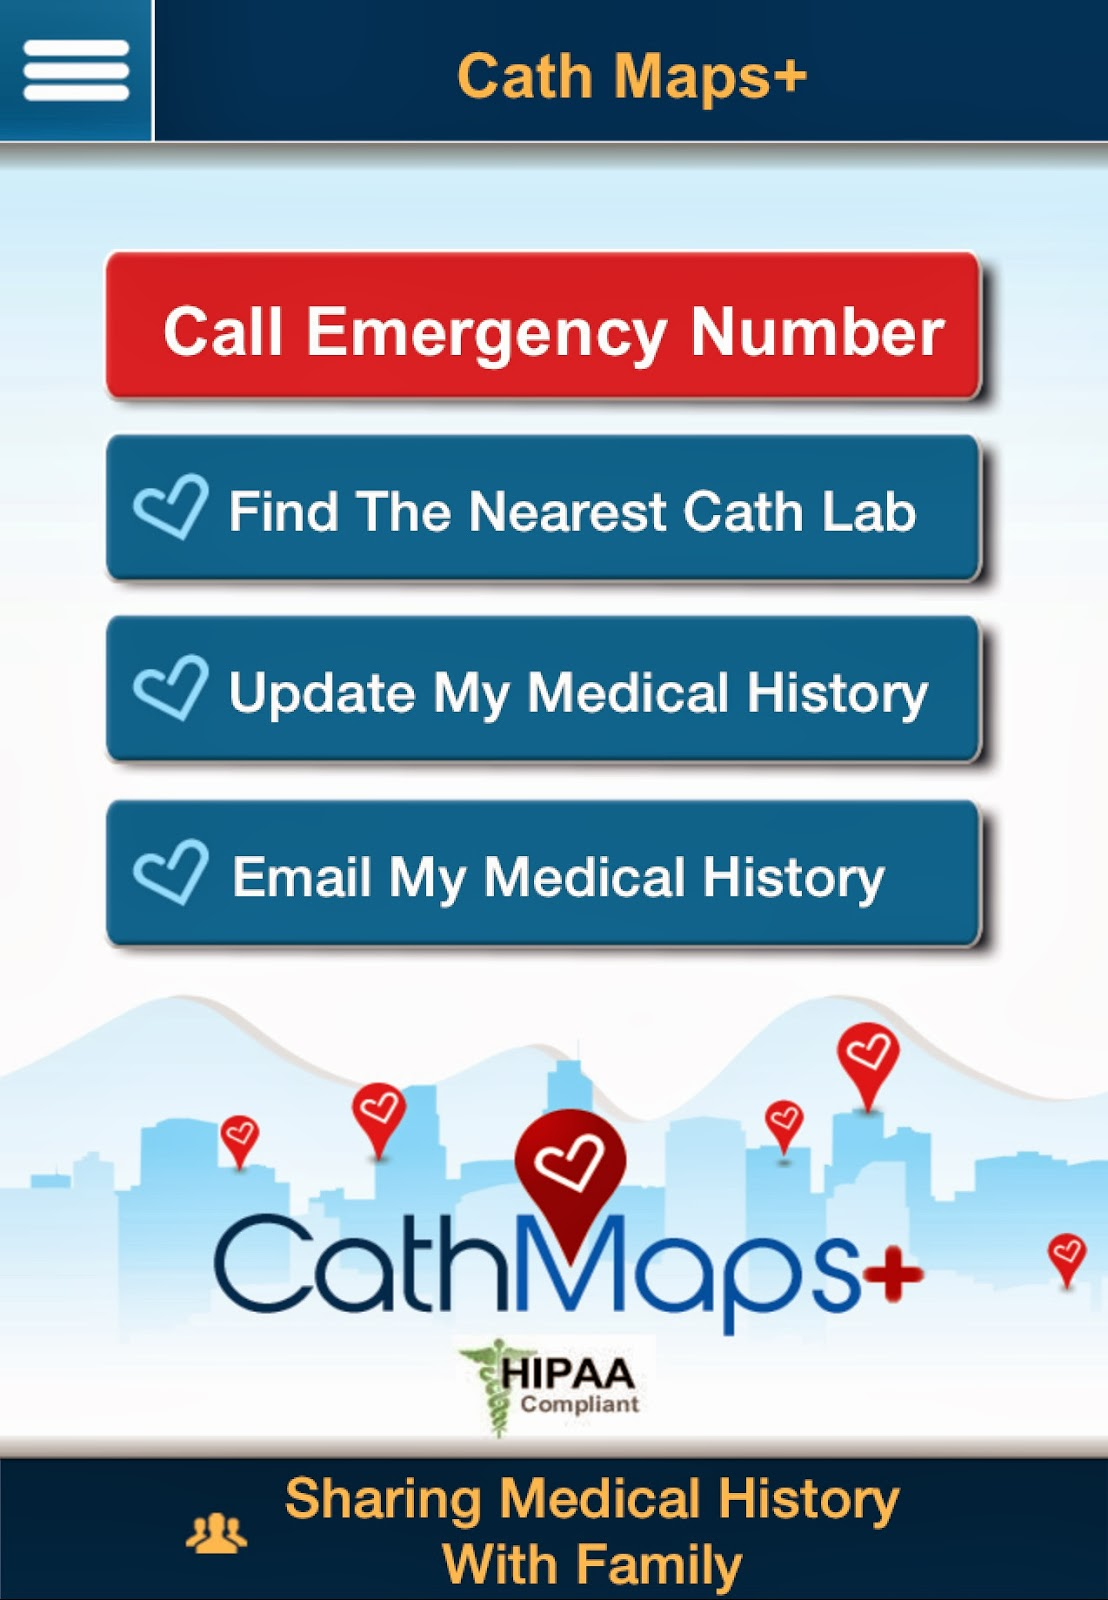 Cathmaps+ App review